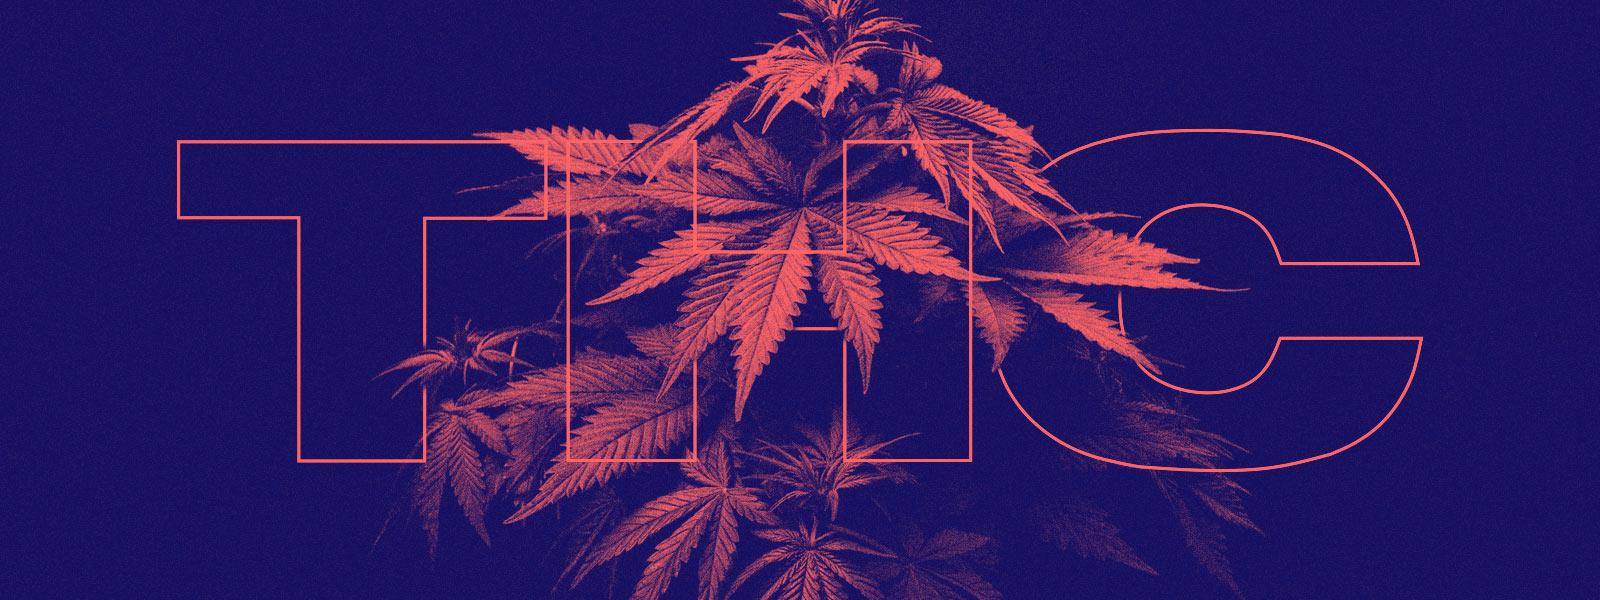 CBD and THC - Tetrahydrocannabinol Explained